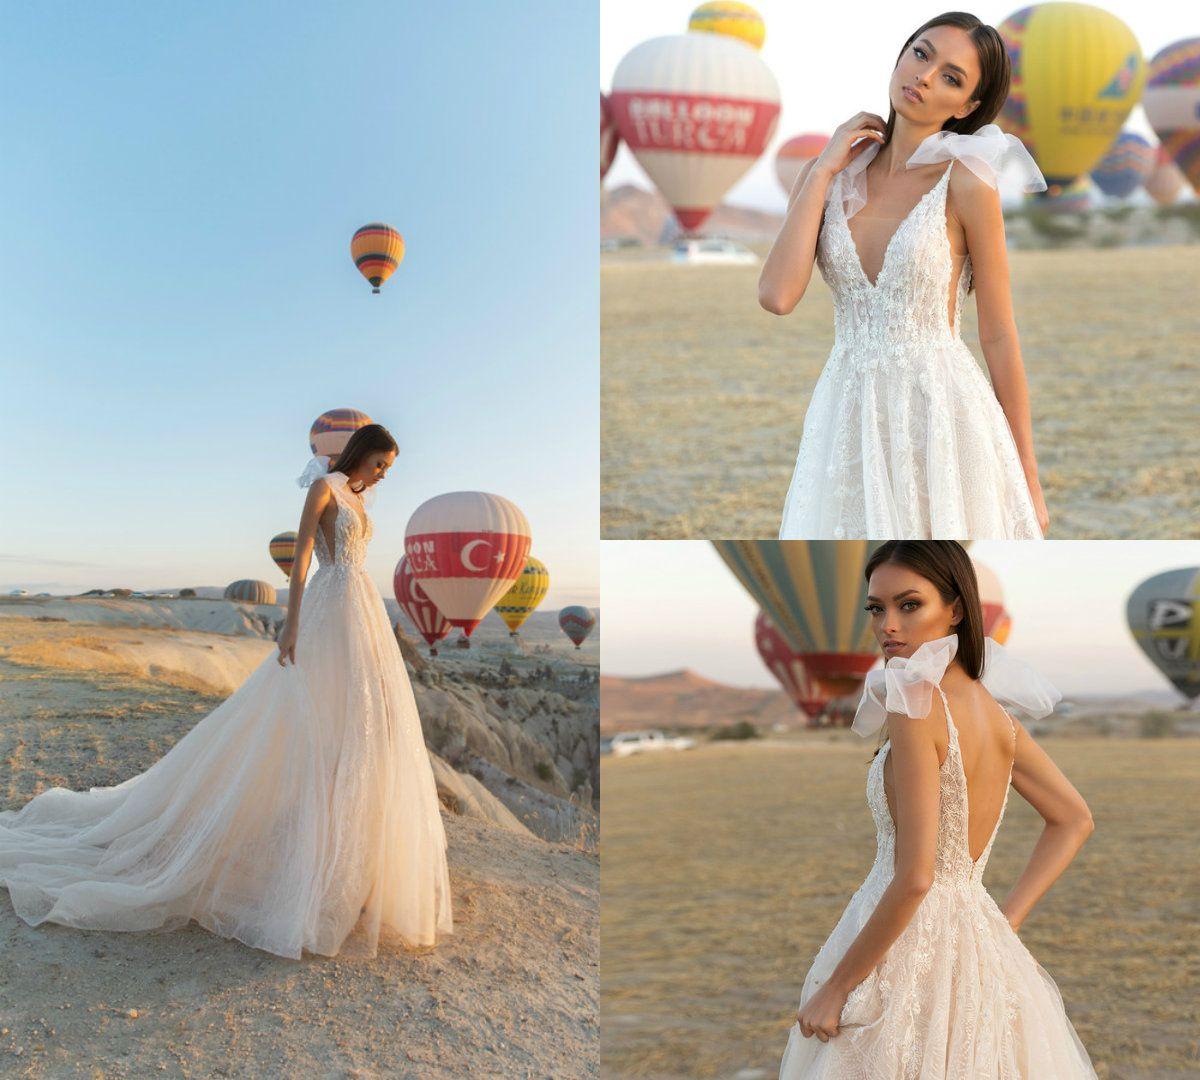 bc455554ac9 ... 2018 eva lendel beach wedding dresses tulle lace sweep train a line  backless boho wedding dress ...